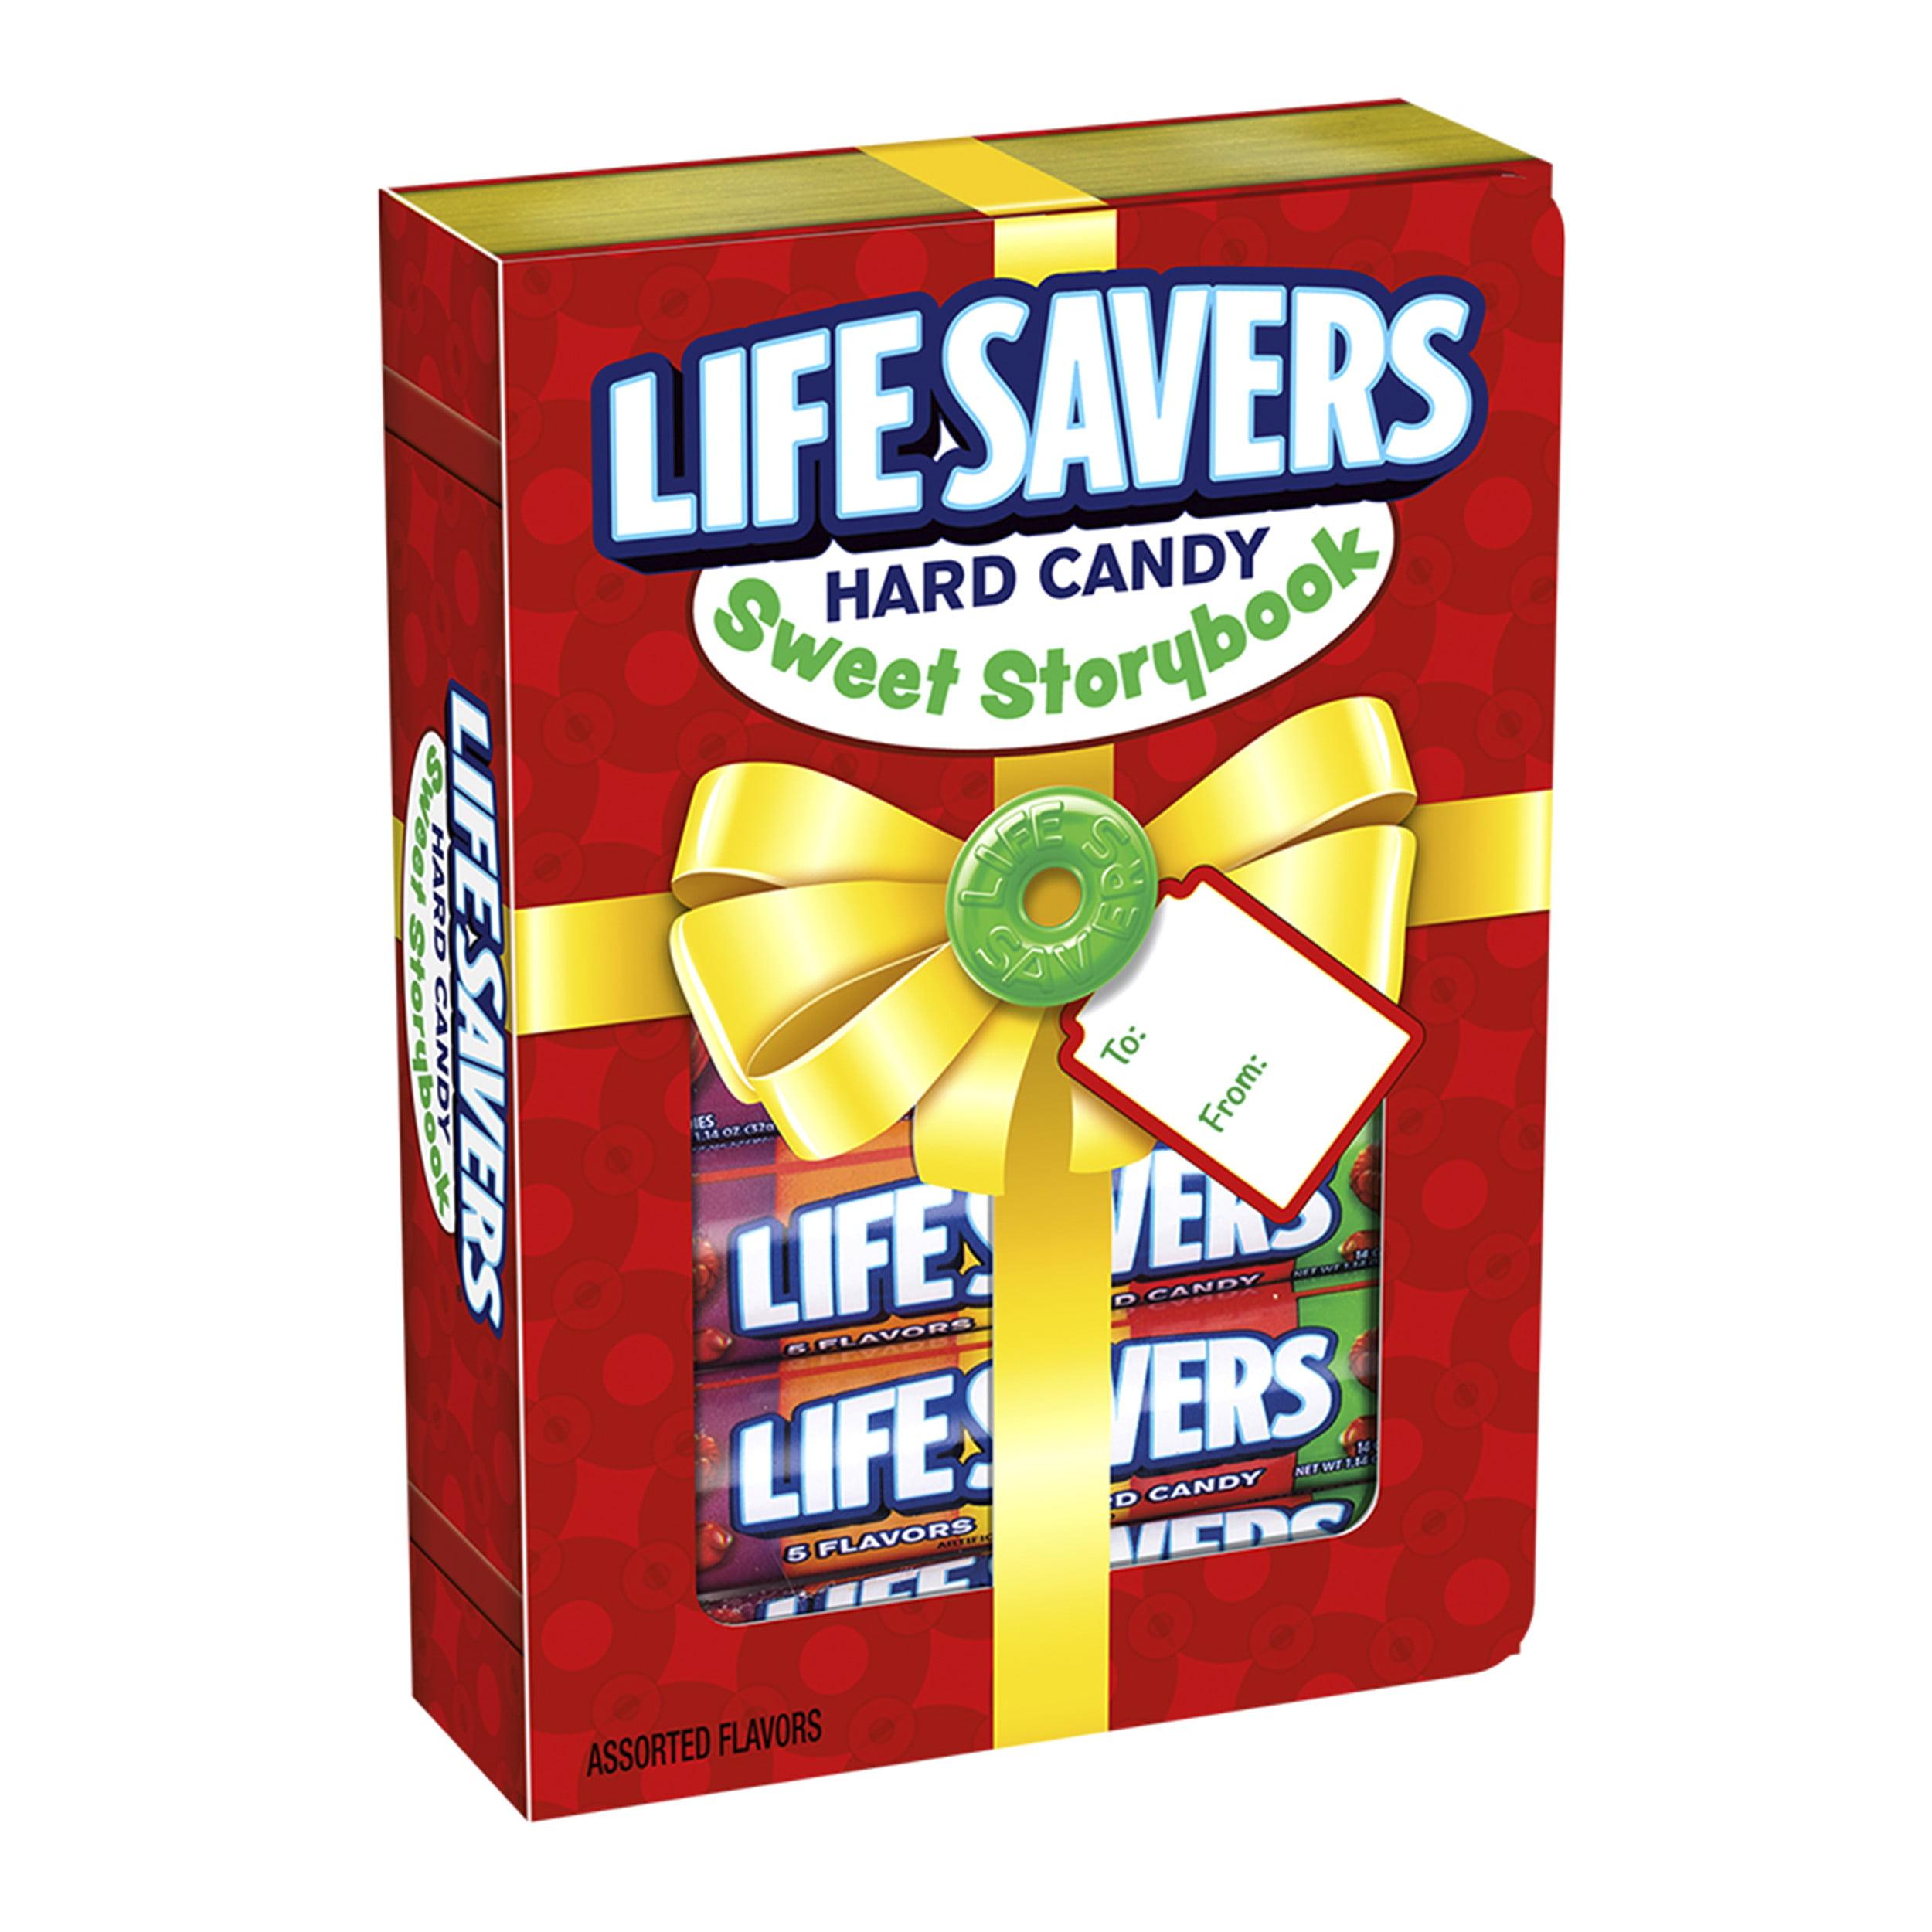 Life Savers 5 Flavors Sweet Storybook Gift Box